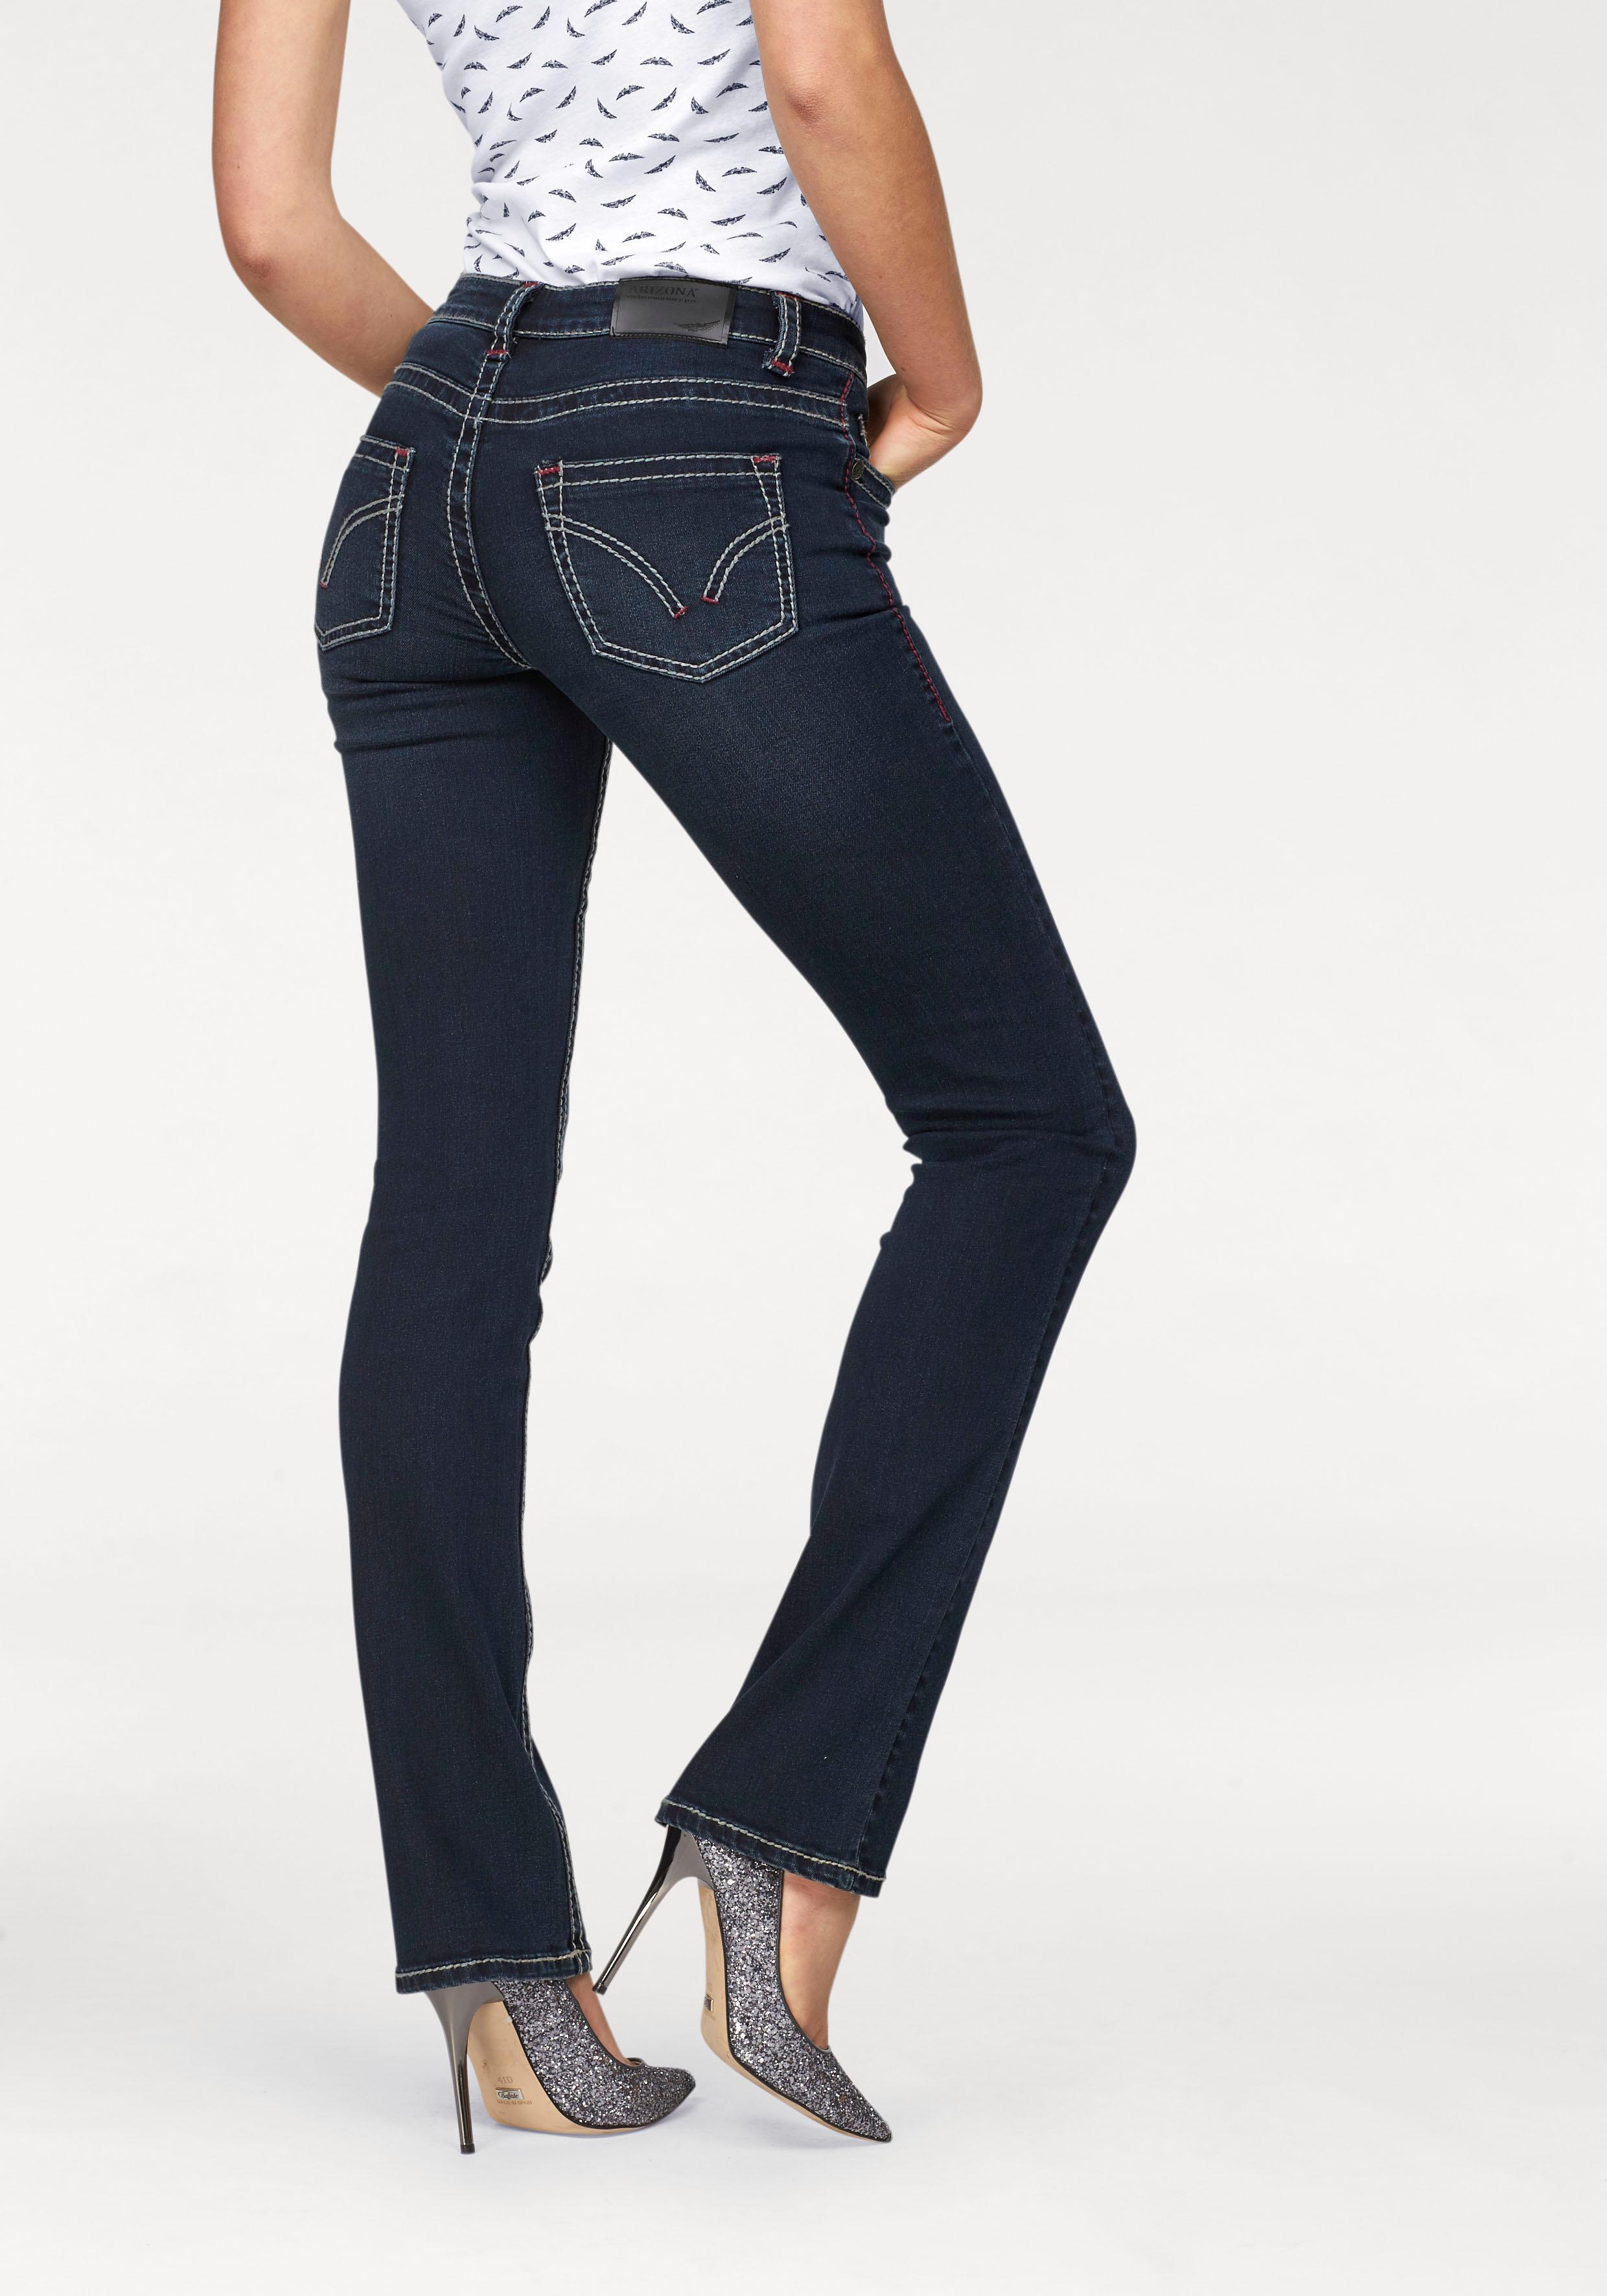 Arizona Gerade Jeans Kontrastnähte   Bekleidung > Jeans > Gerade Jeans   Blau   Arizona